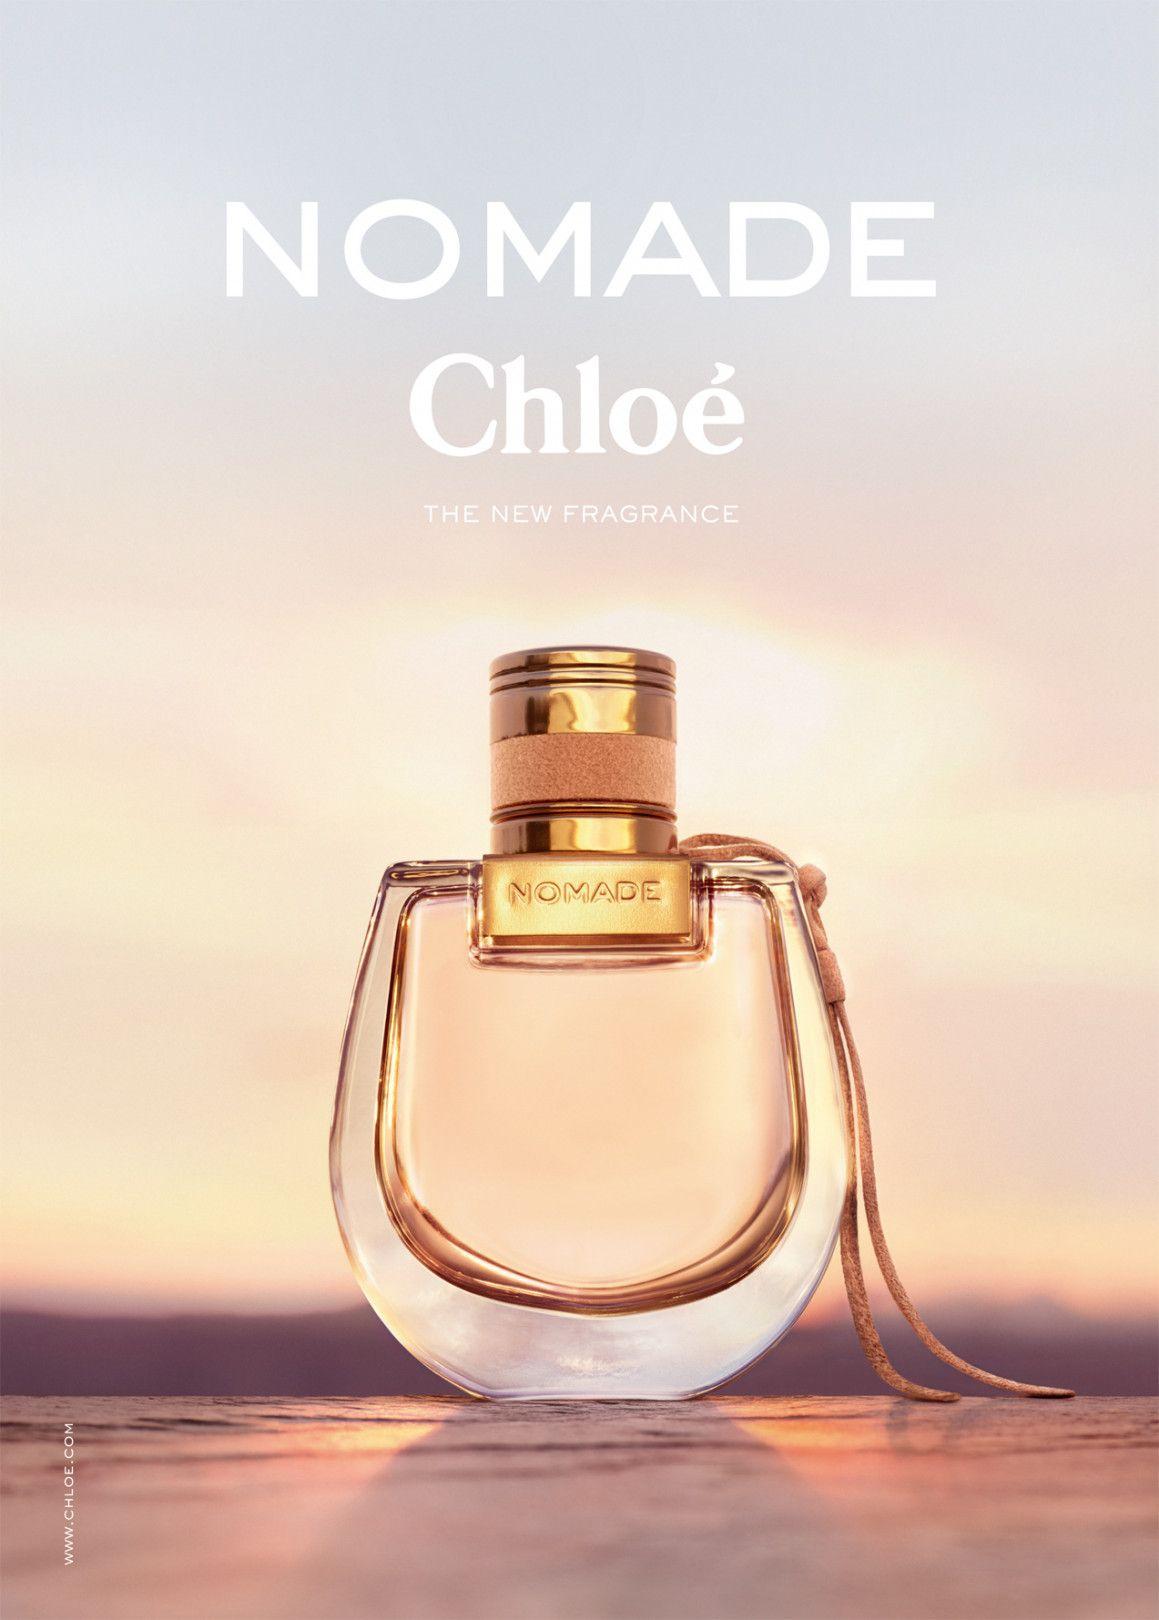 133bcdf426d Perfume  Chloe - nomade